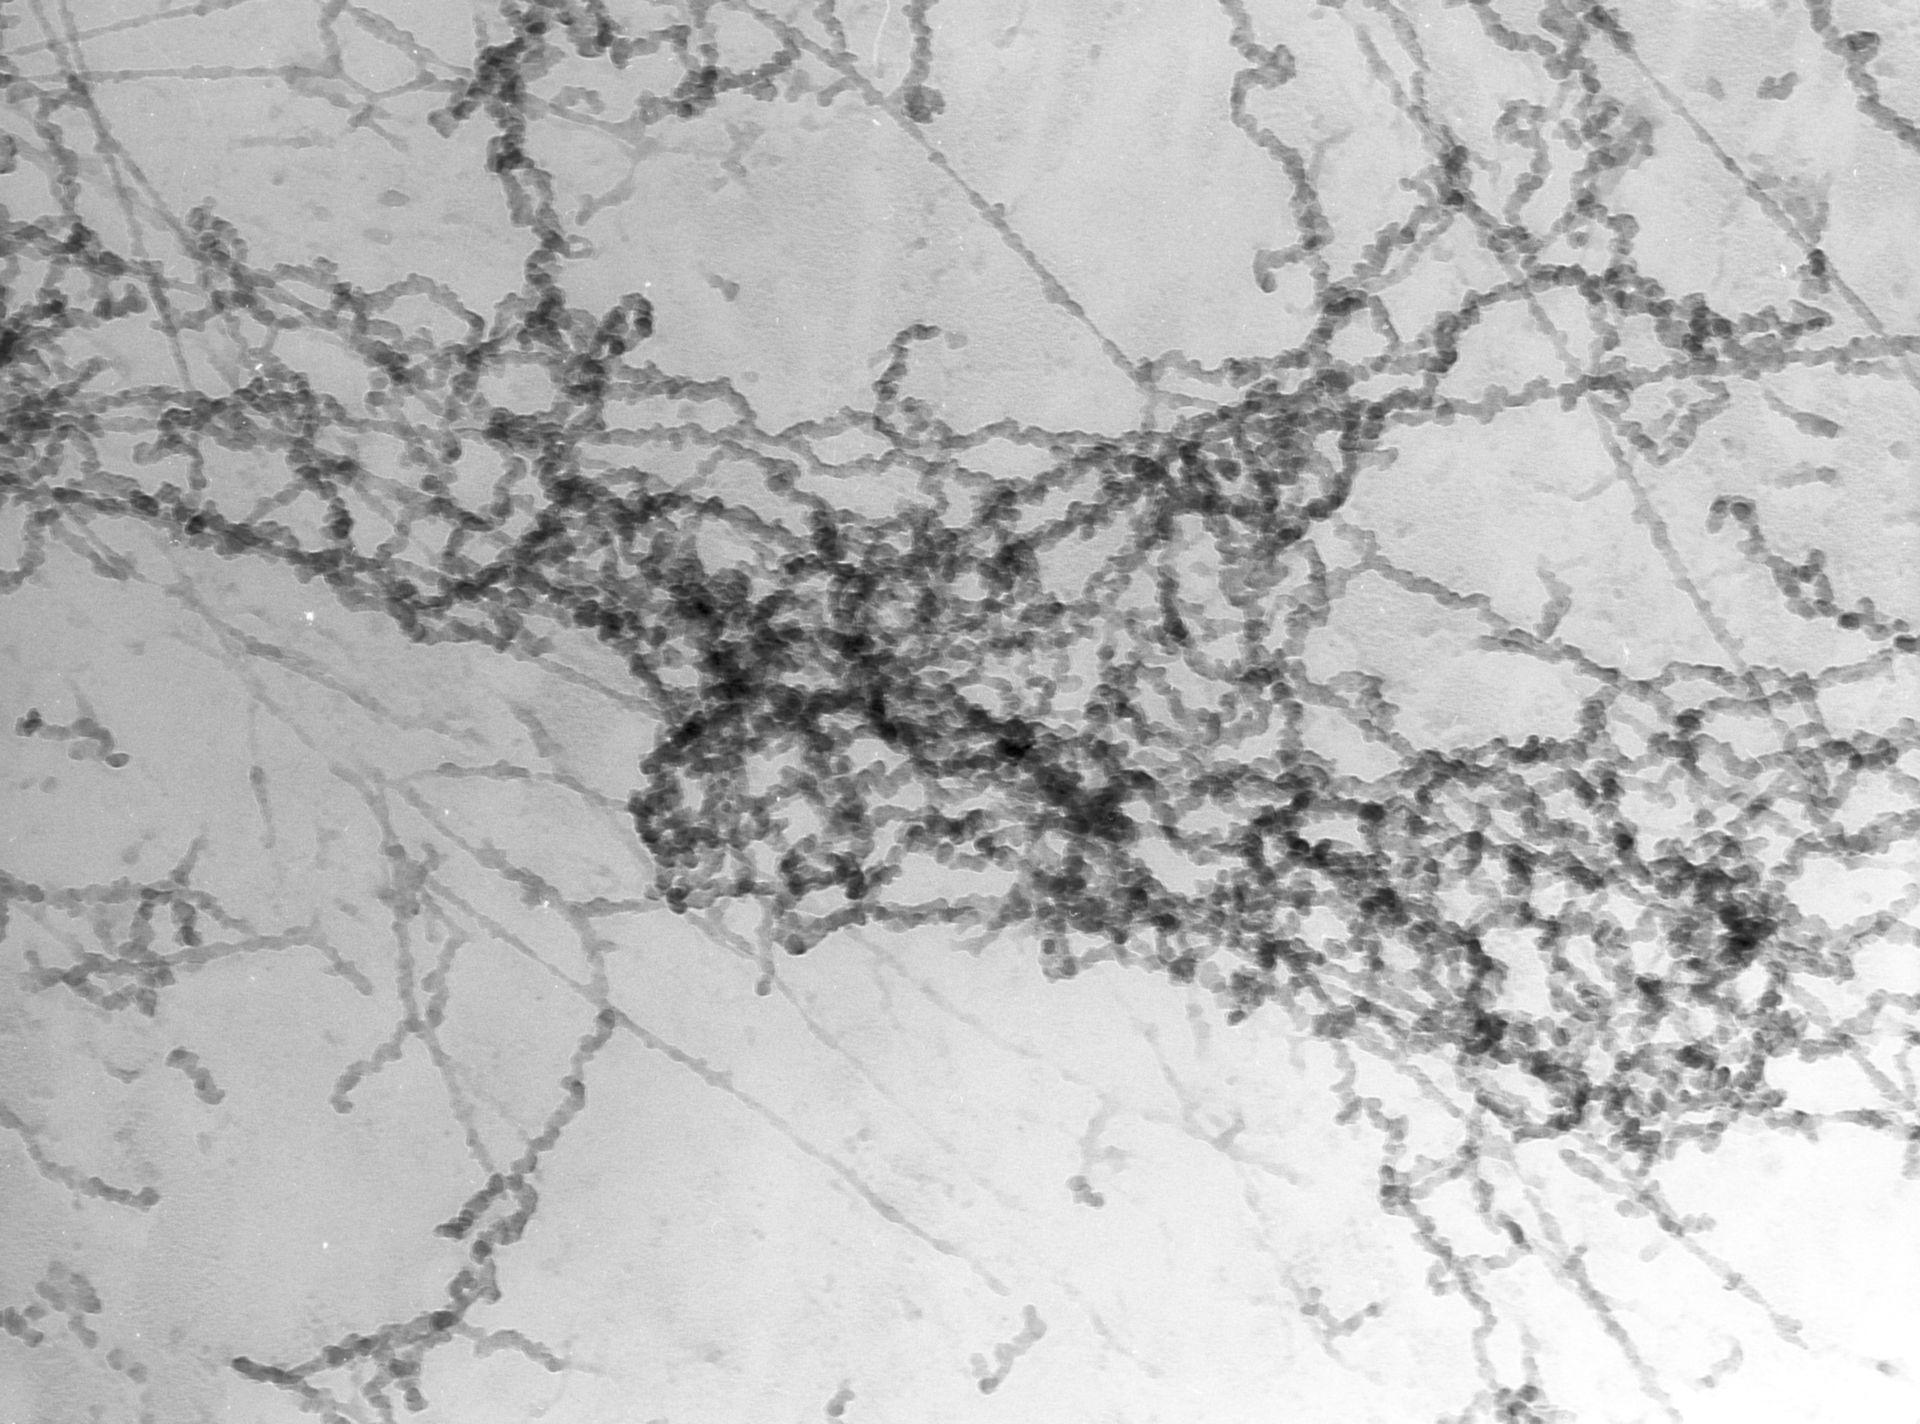 Notopthalmus viridescence (Nuclear chromatin) - CIL:10082